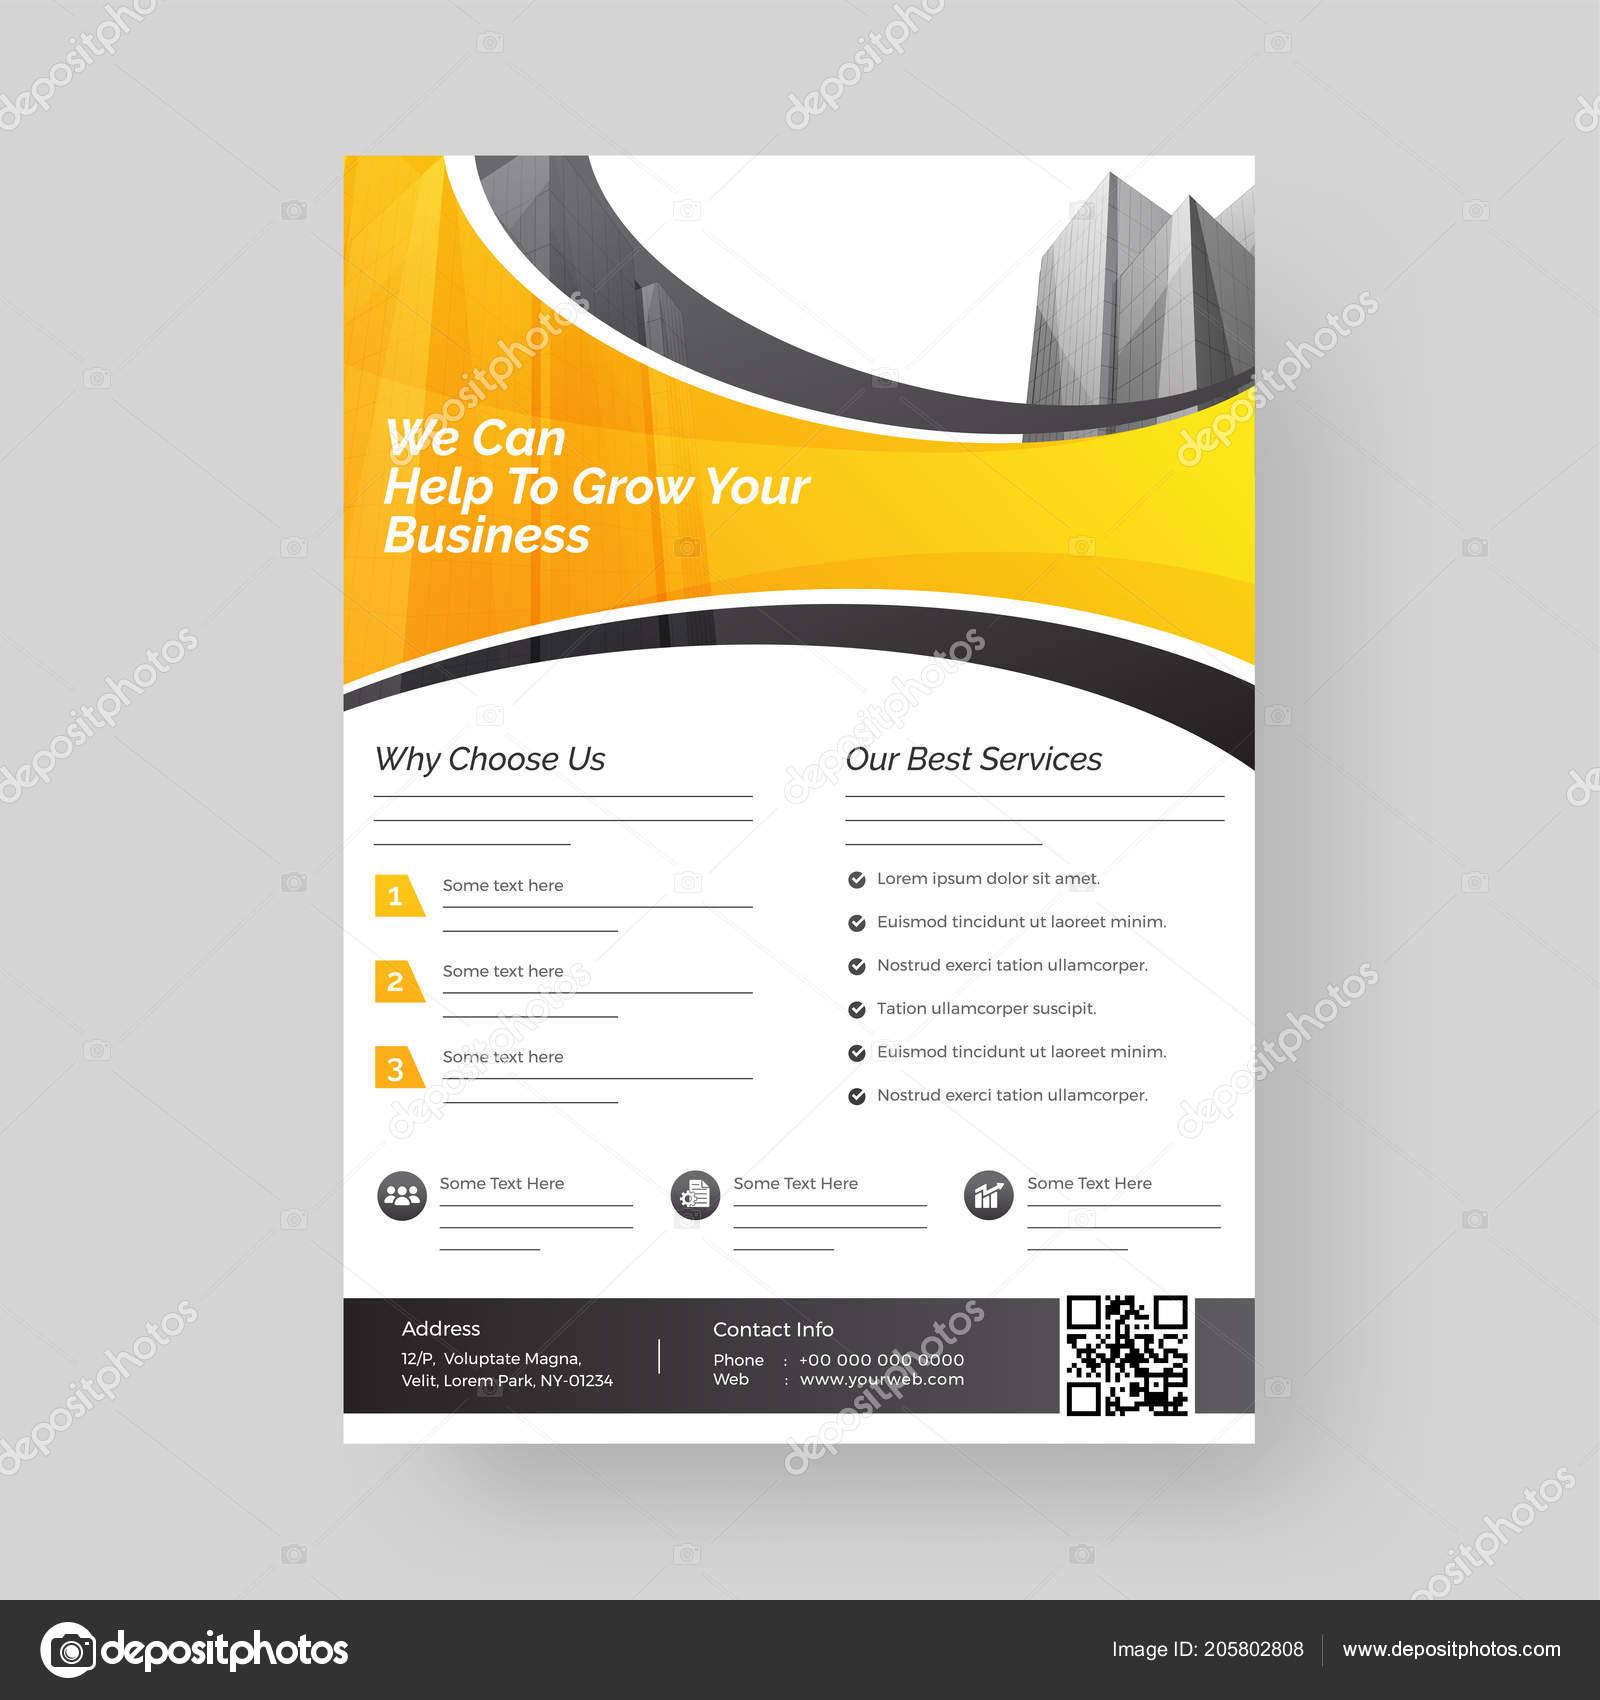 template flyer design business growth marketing concept vetores de